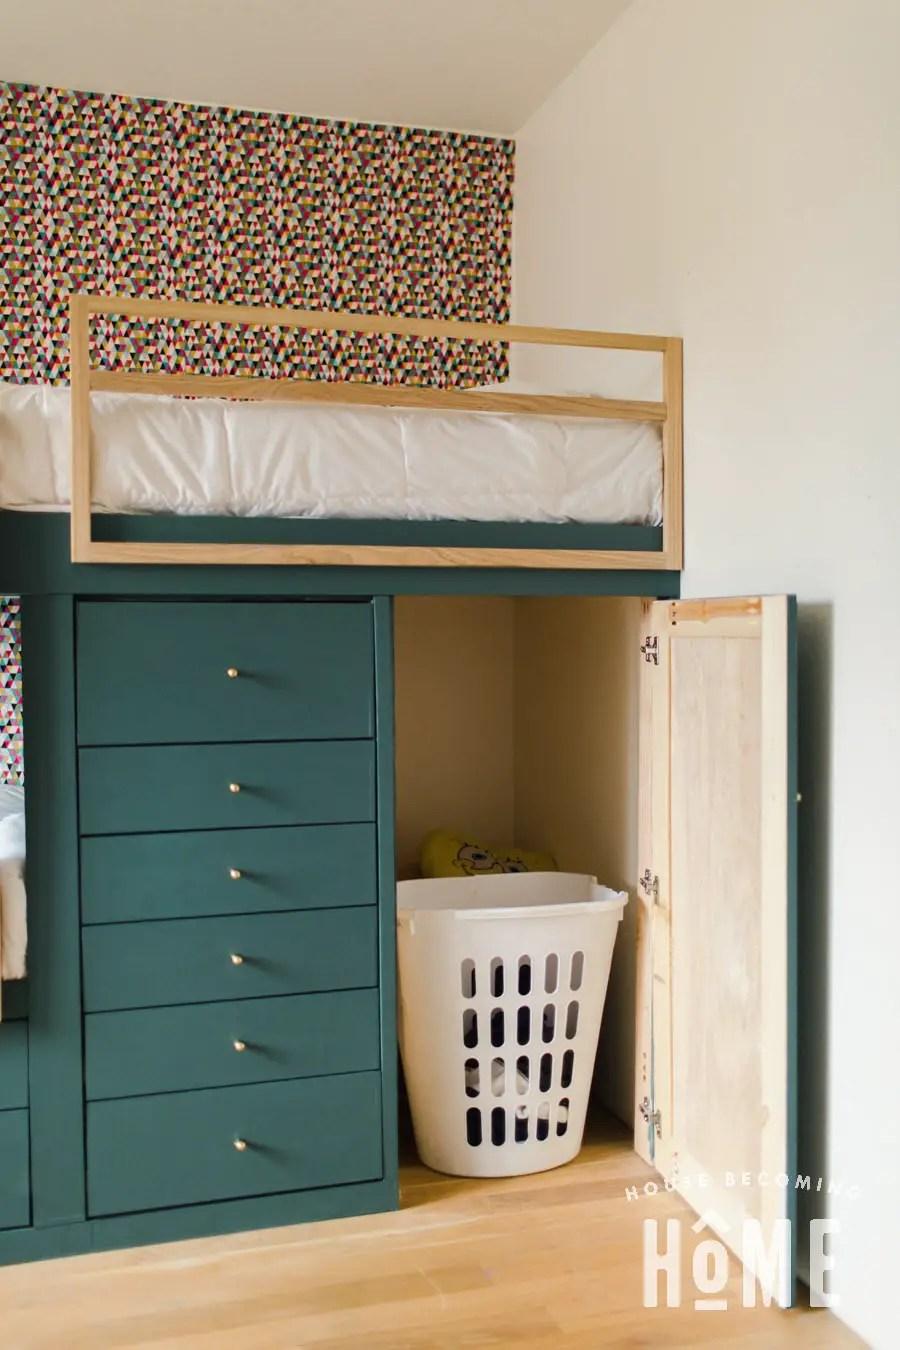 Laundry Basket Storage inside Built in Bunk Beds